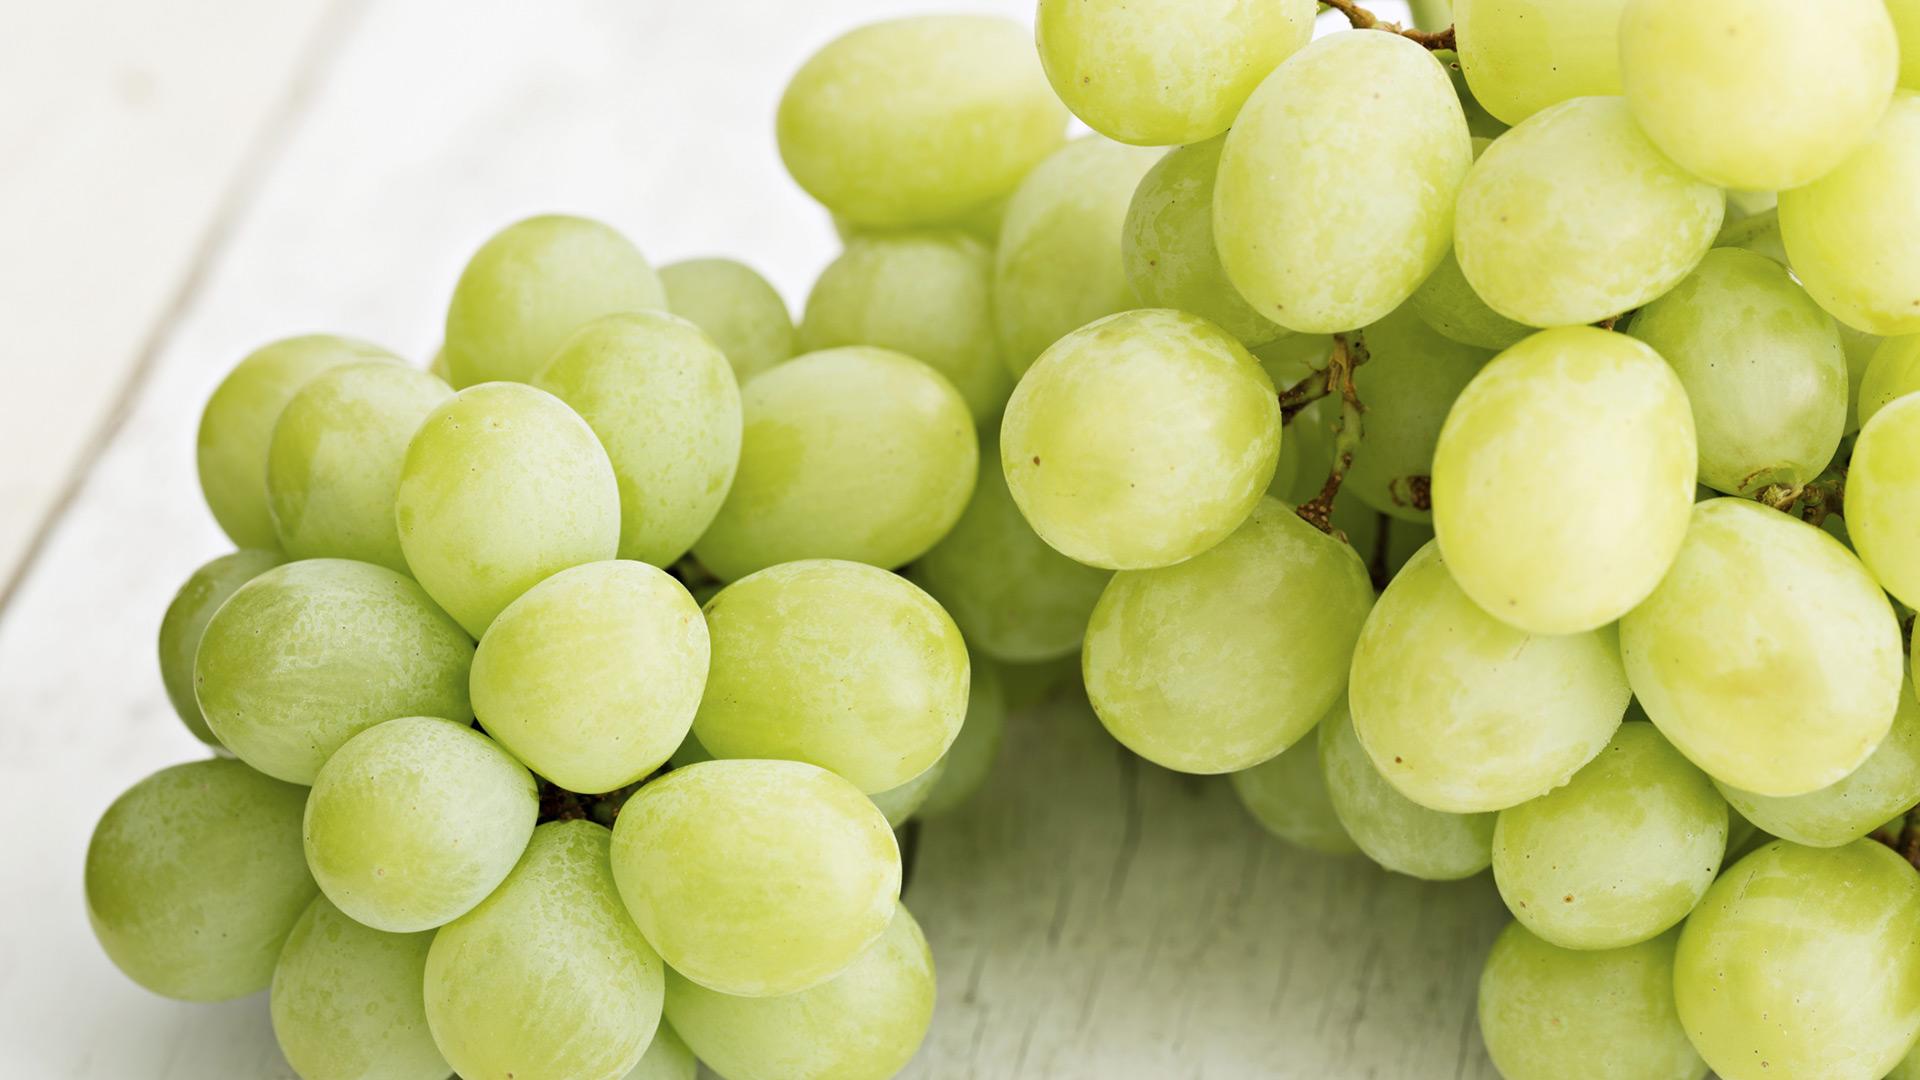 Green Grapes | Sheknows.com